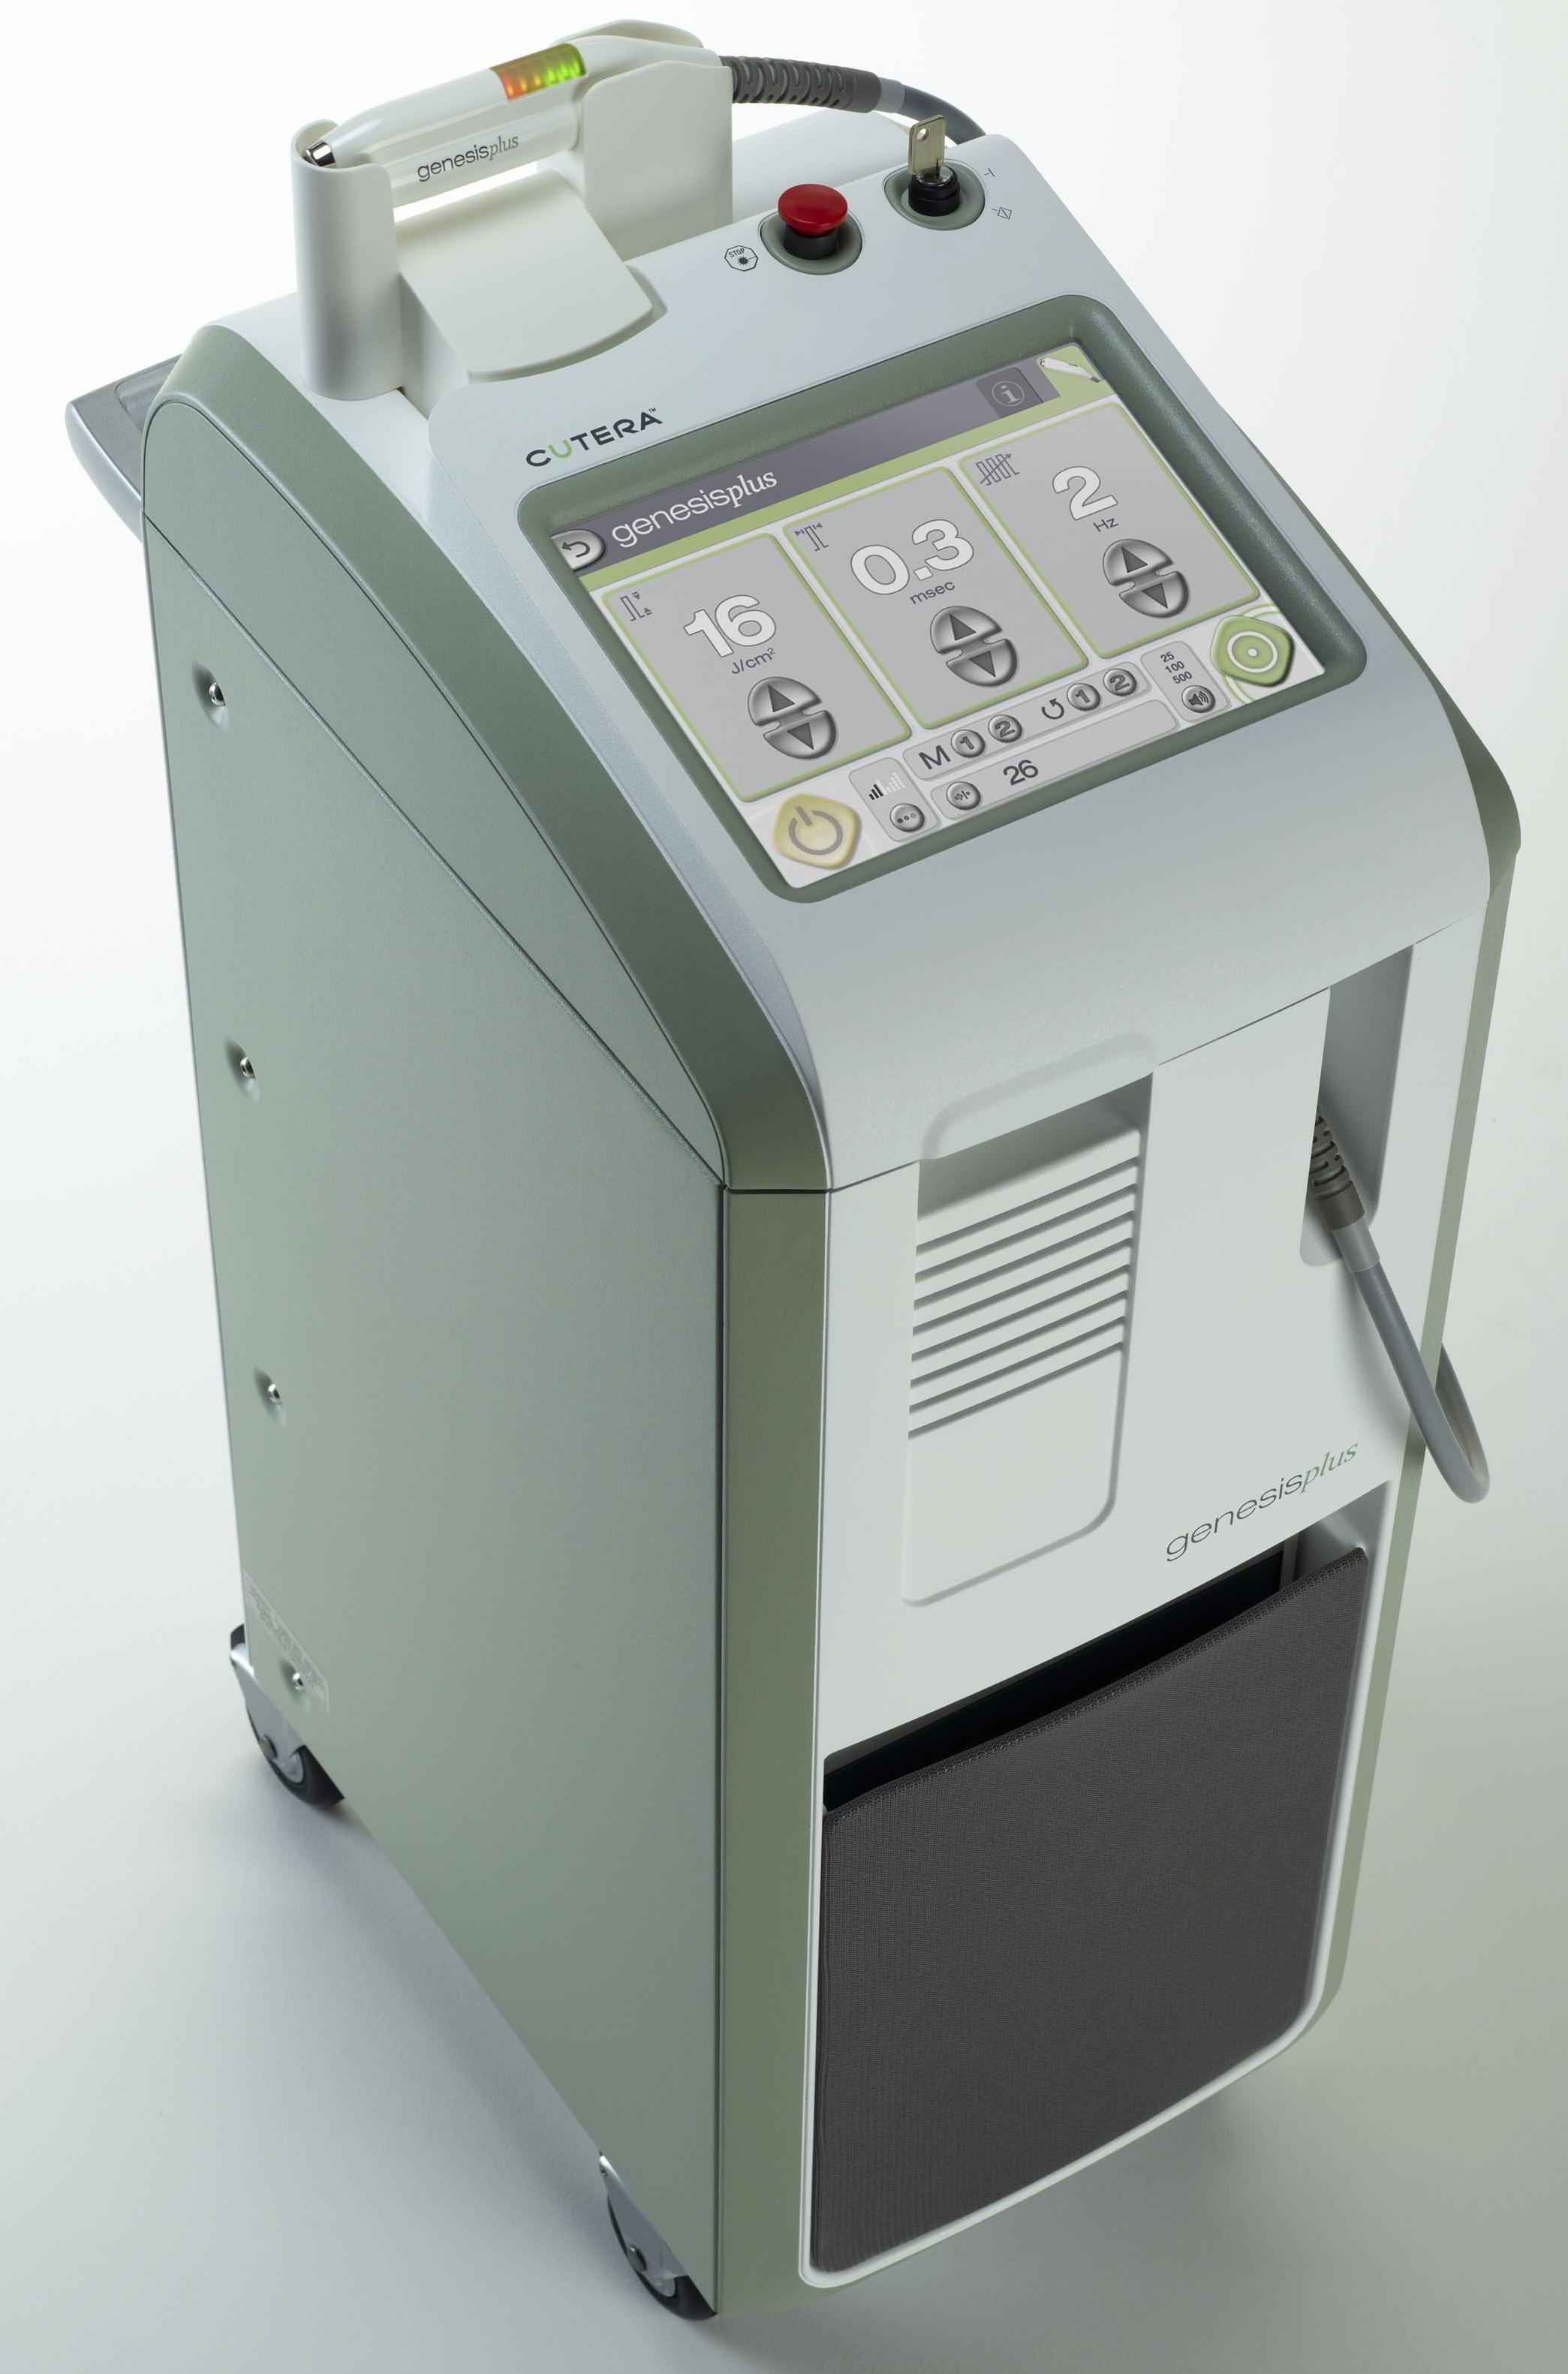 GenesisPlus Laser for Toenail Fungus